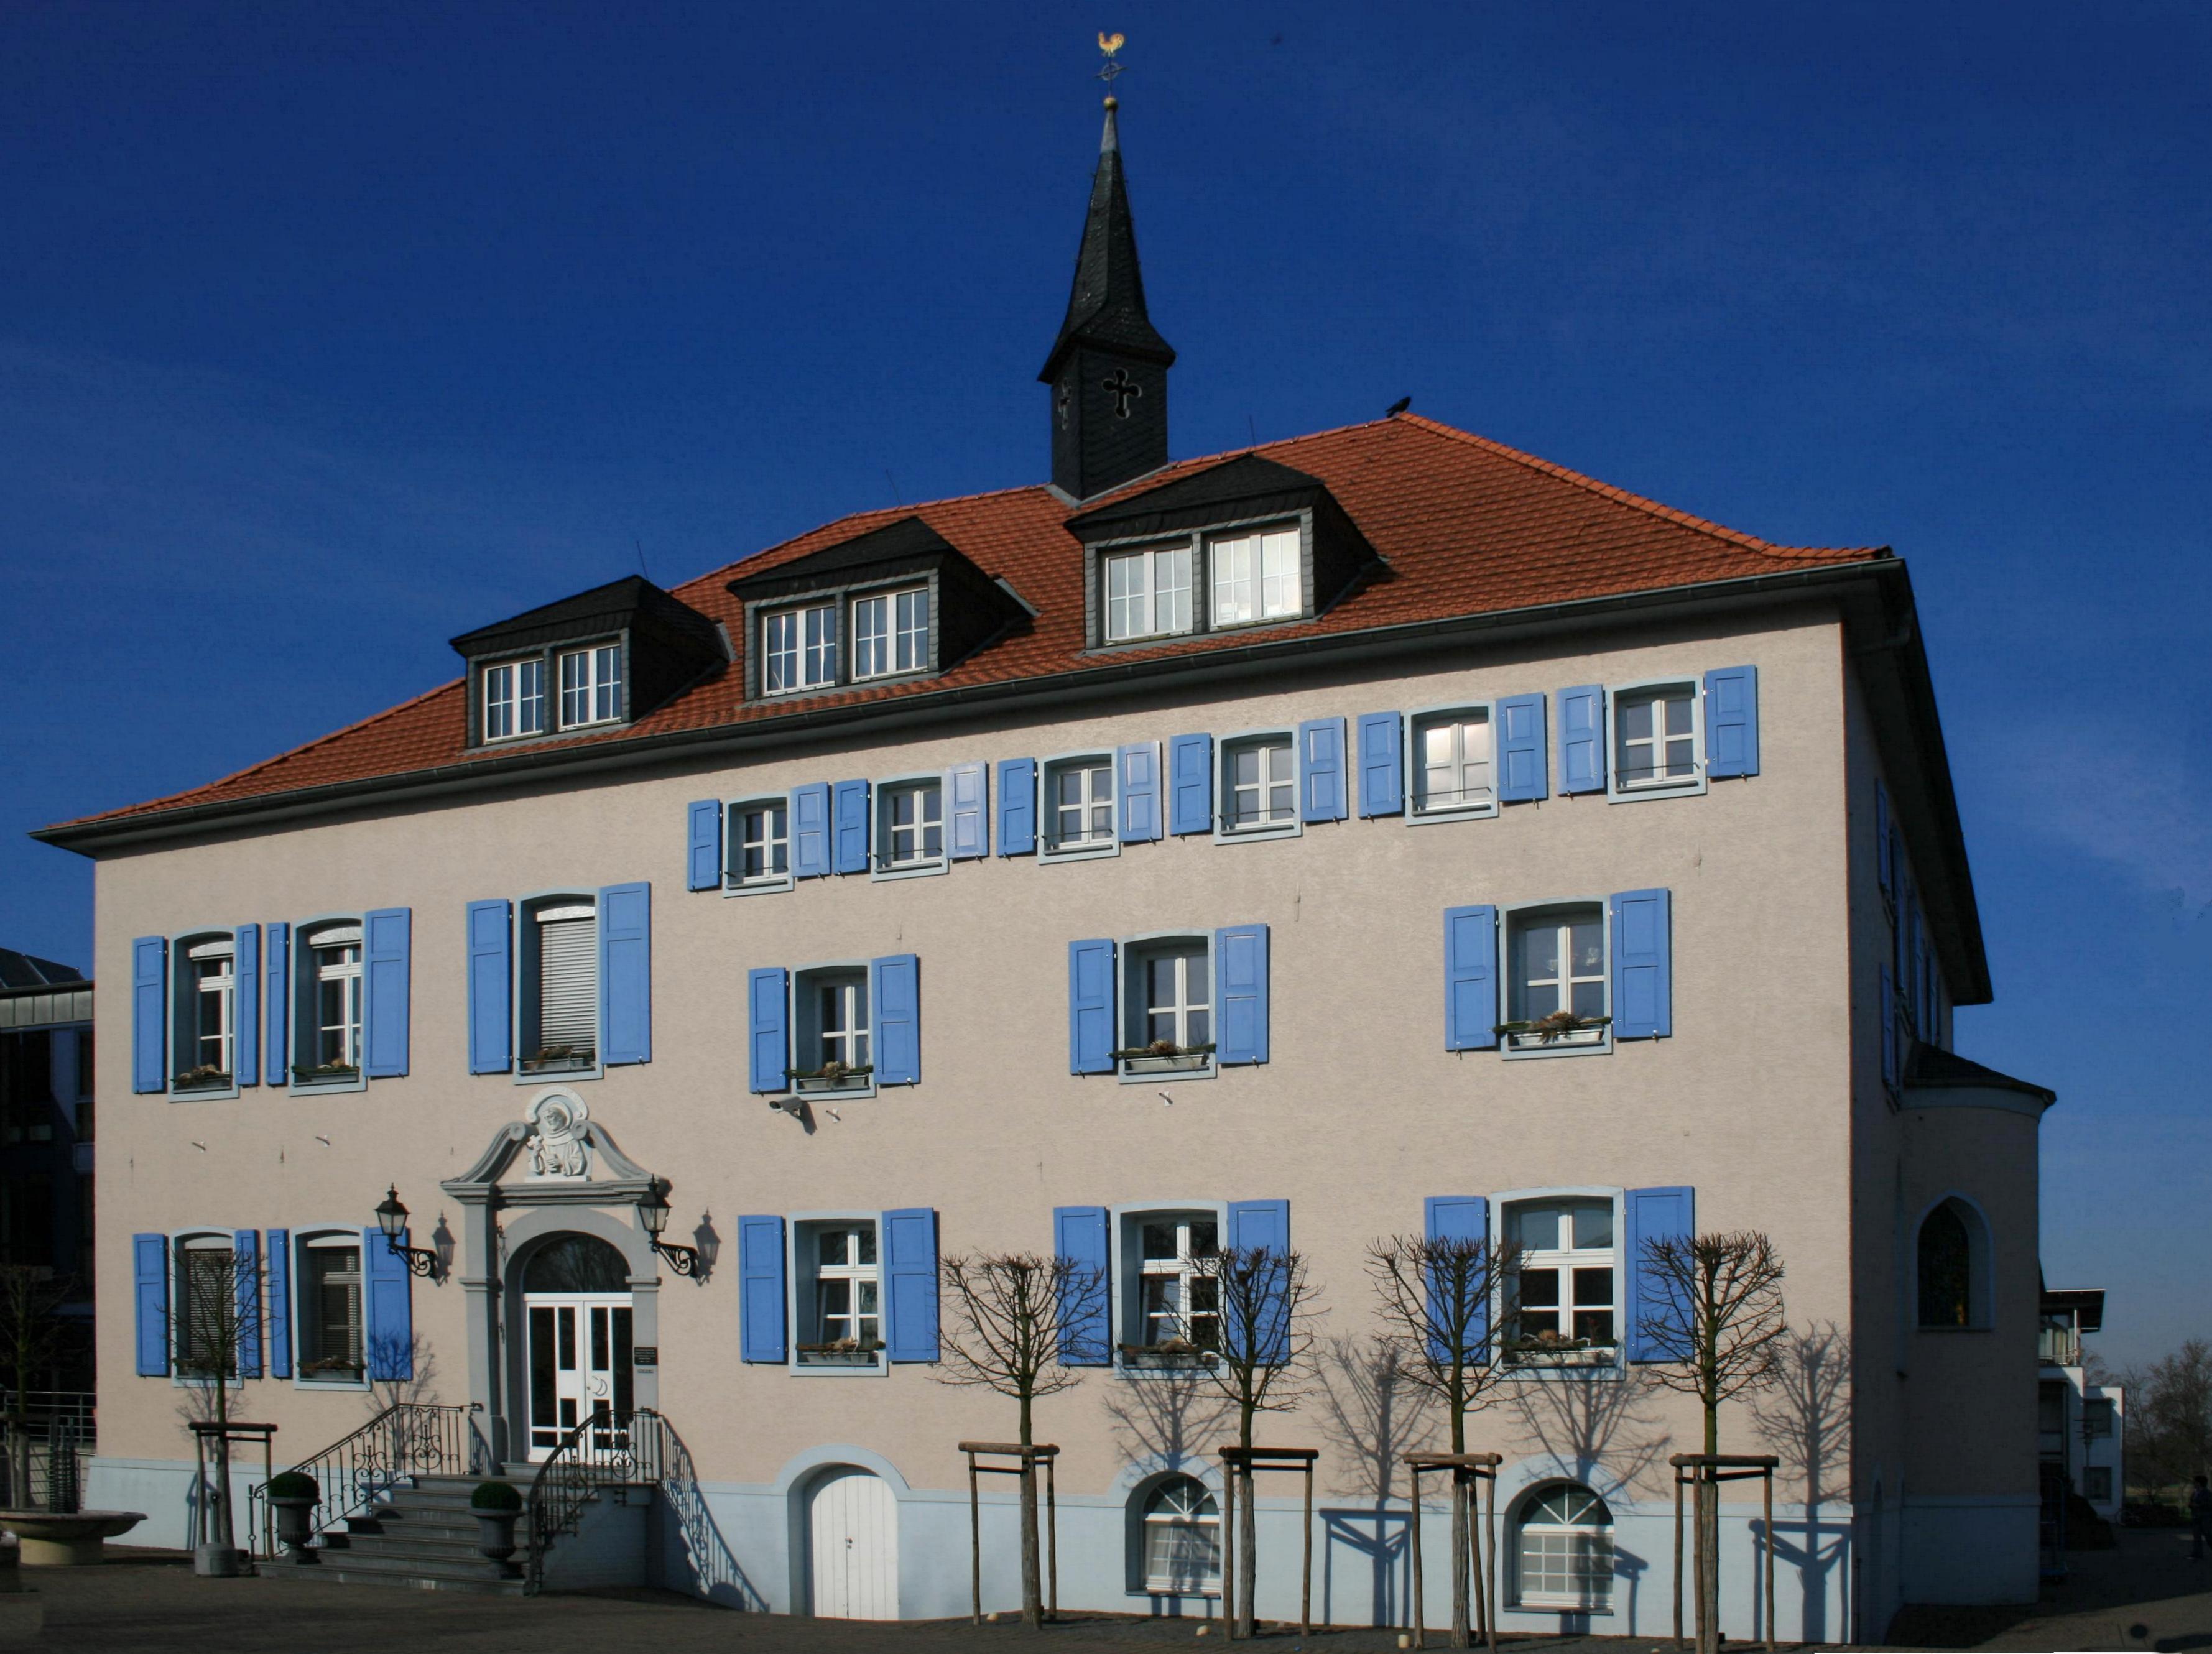 St. Gereon Seniorendienste, gGmbH, Haus Berg